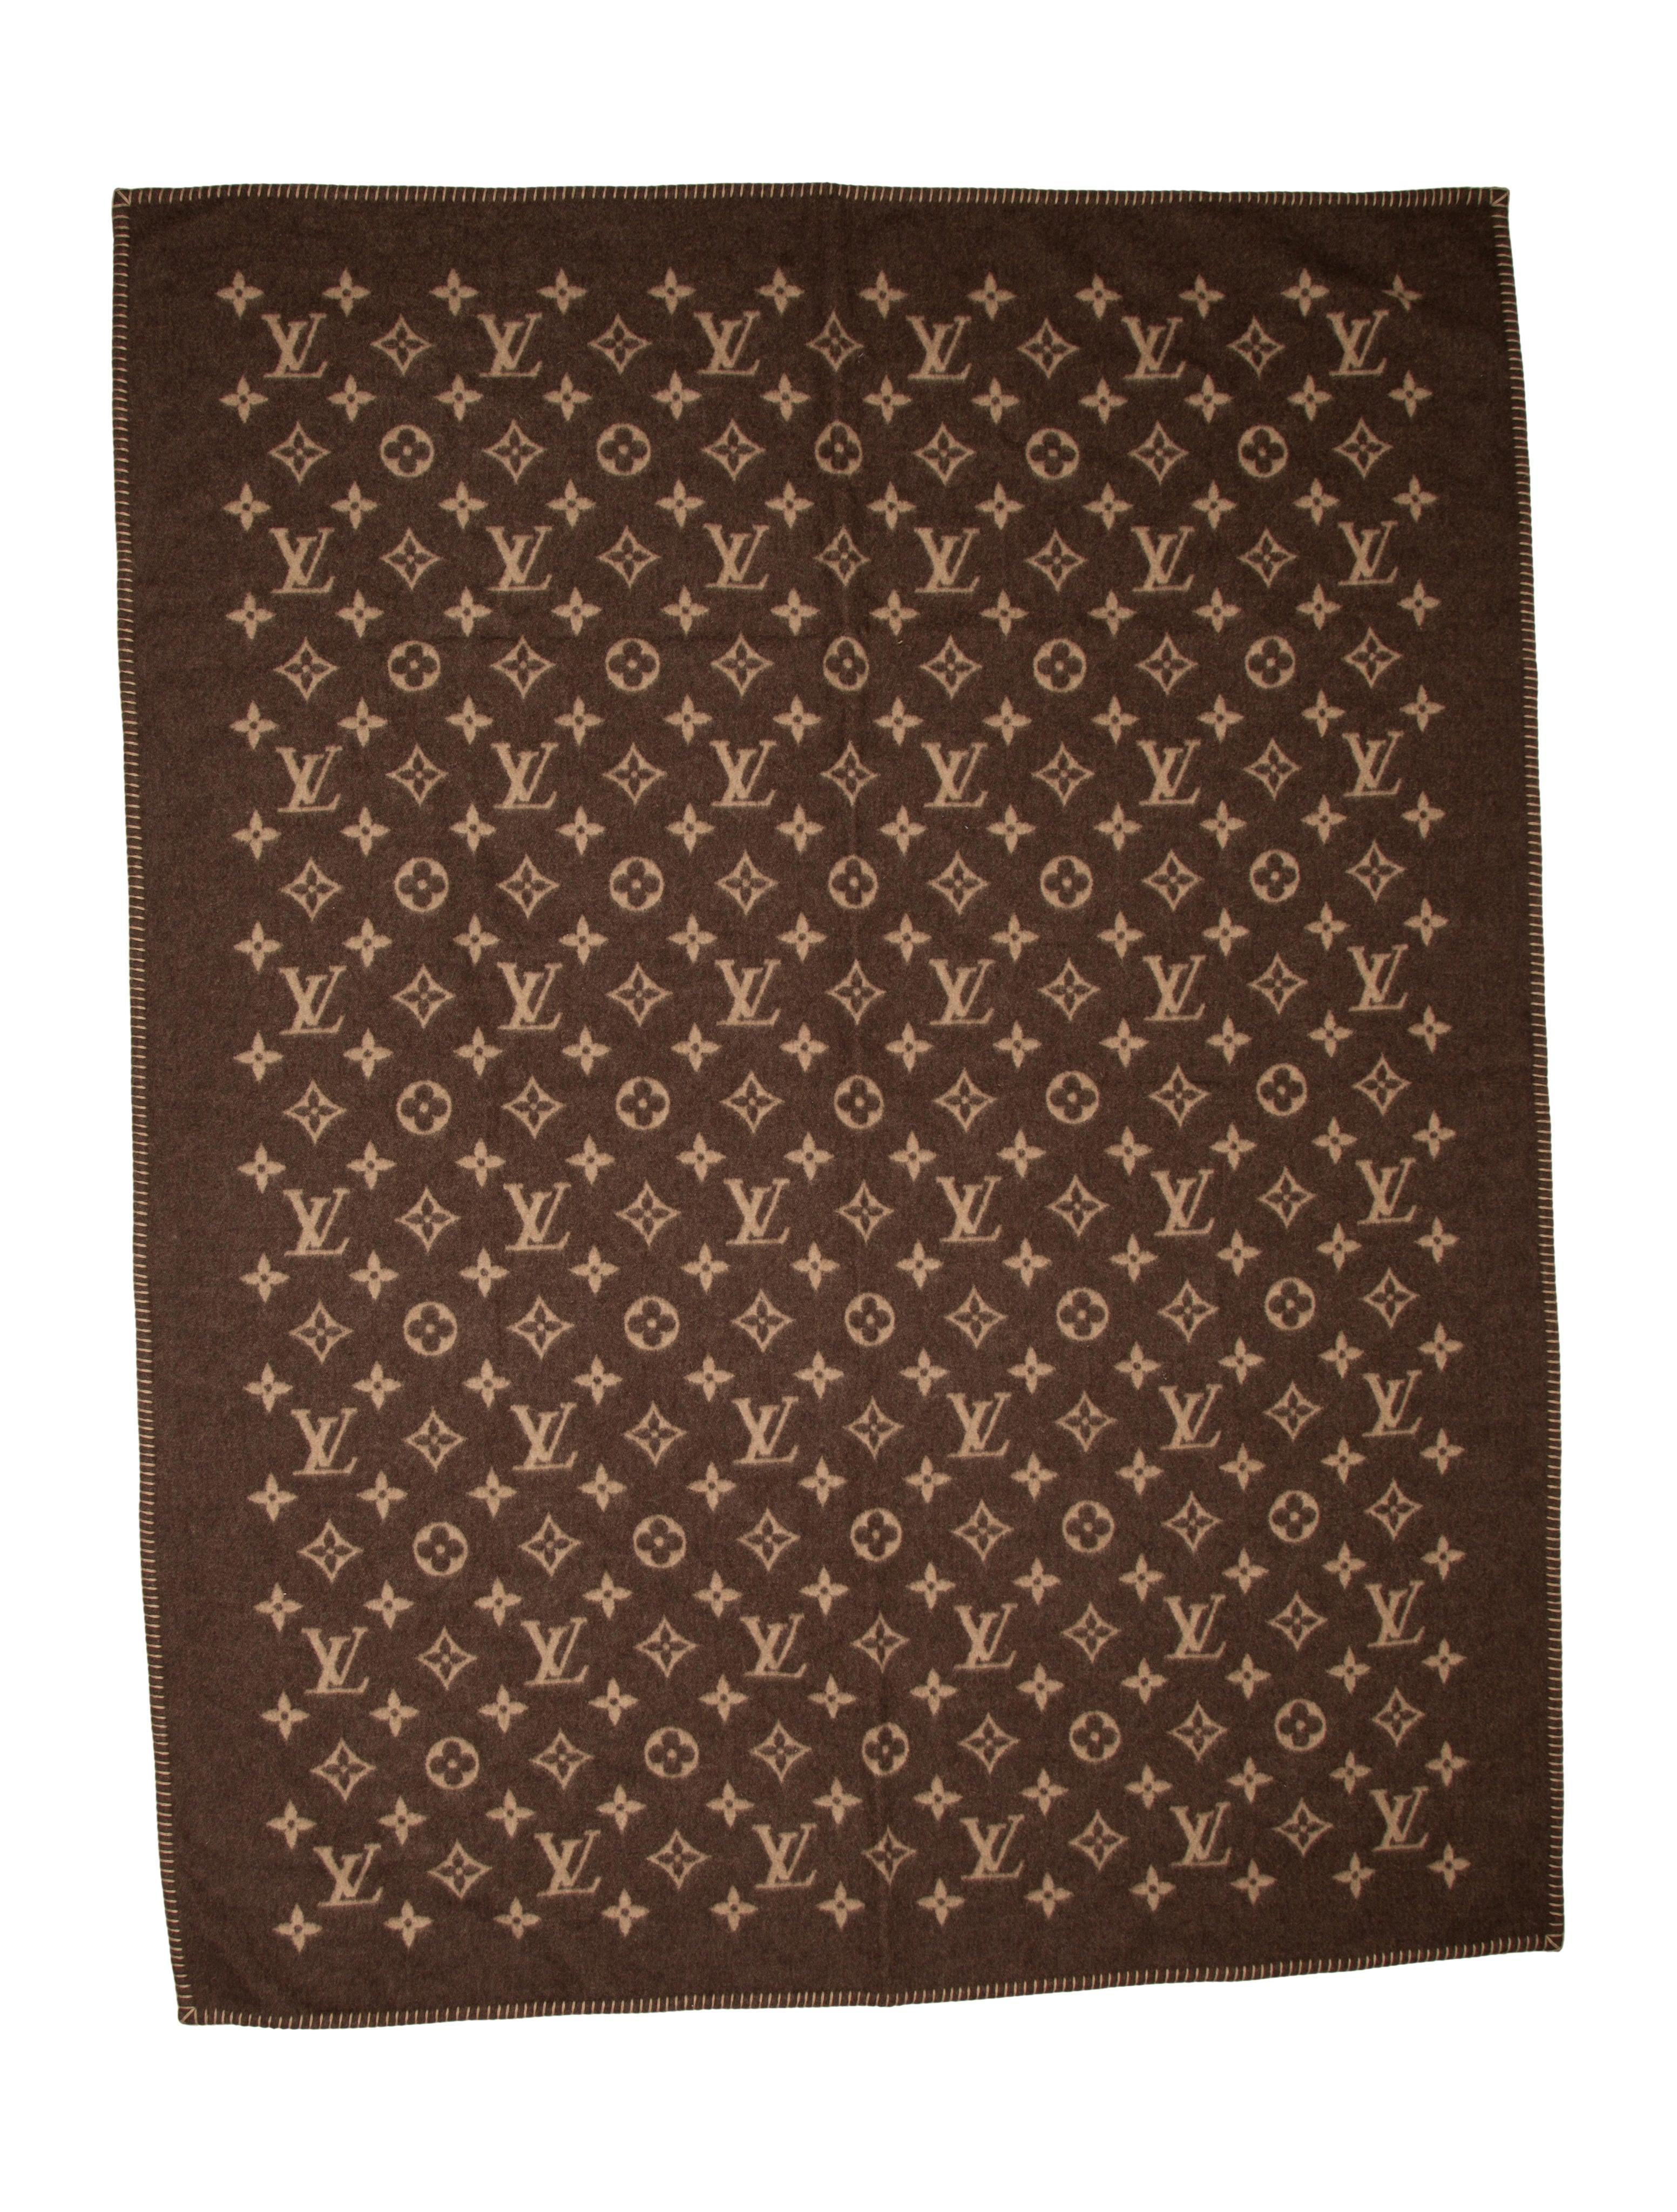 1c1a30cd883 Louis Vuitton Monogram Blanket - Pillows   Throws - LOU41864